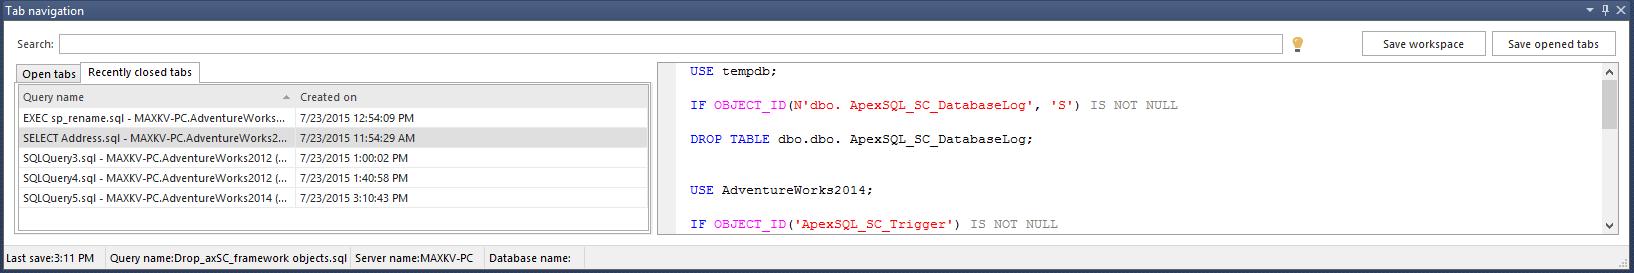 SQL SERVER - Free SQL Complete Add-in For SSMS addin14